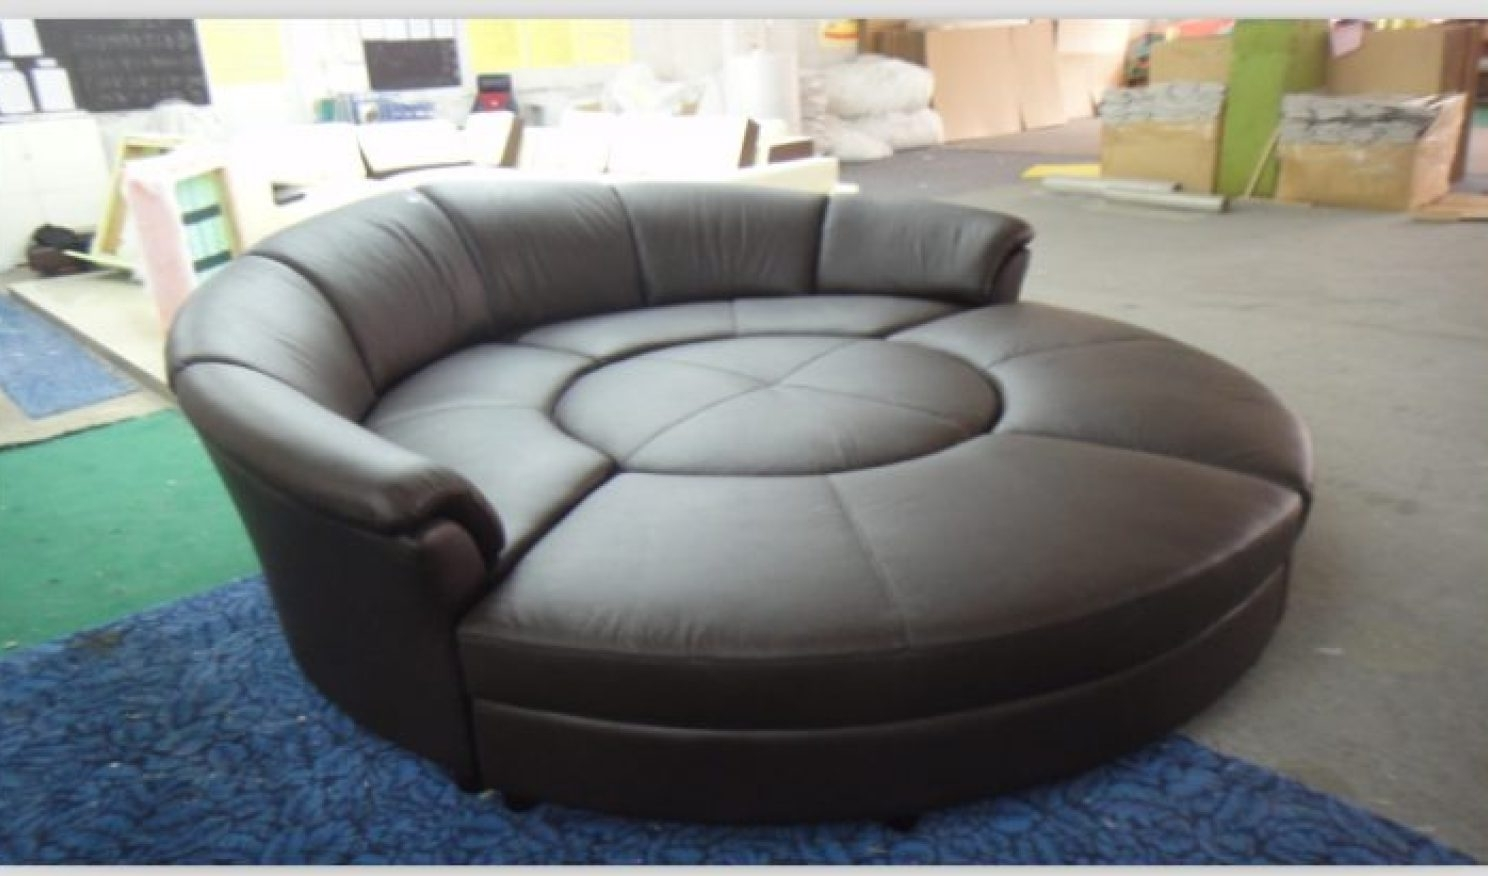 Circular Sofa Chairs For 2018 Sofa : Sofa Cute Big Chairs Stunning Circular Chair Explore Round (View 3 of 20)